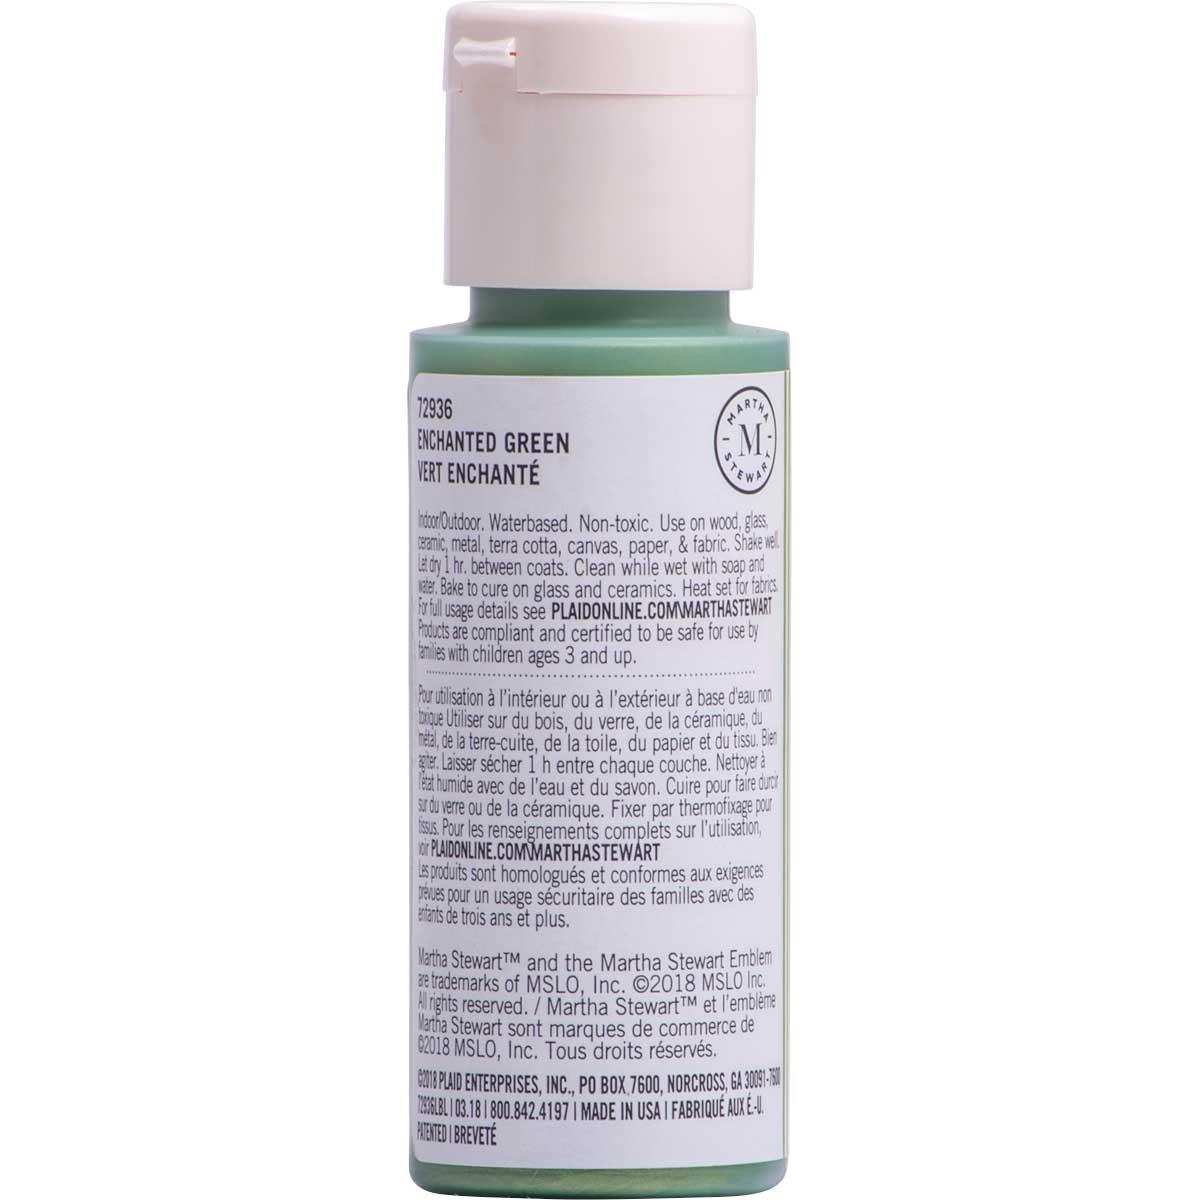 Martha Stewart ® Multi-Surface Pearl Acrylic Craft Paint CPSIA - Enchanted Green, 2 oz. - 72936